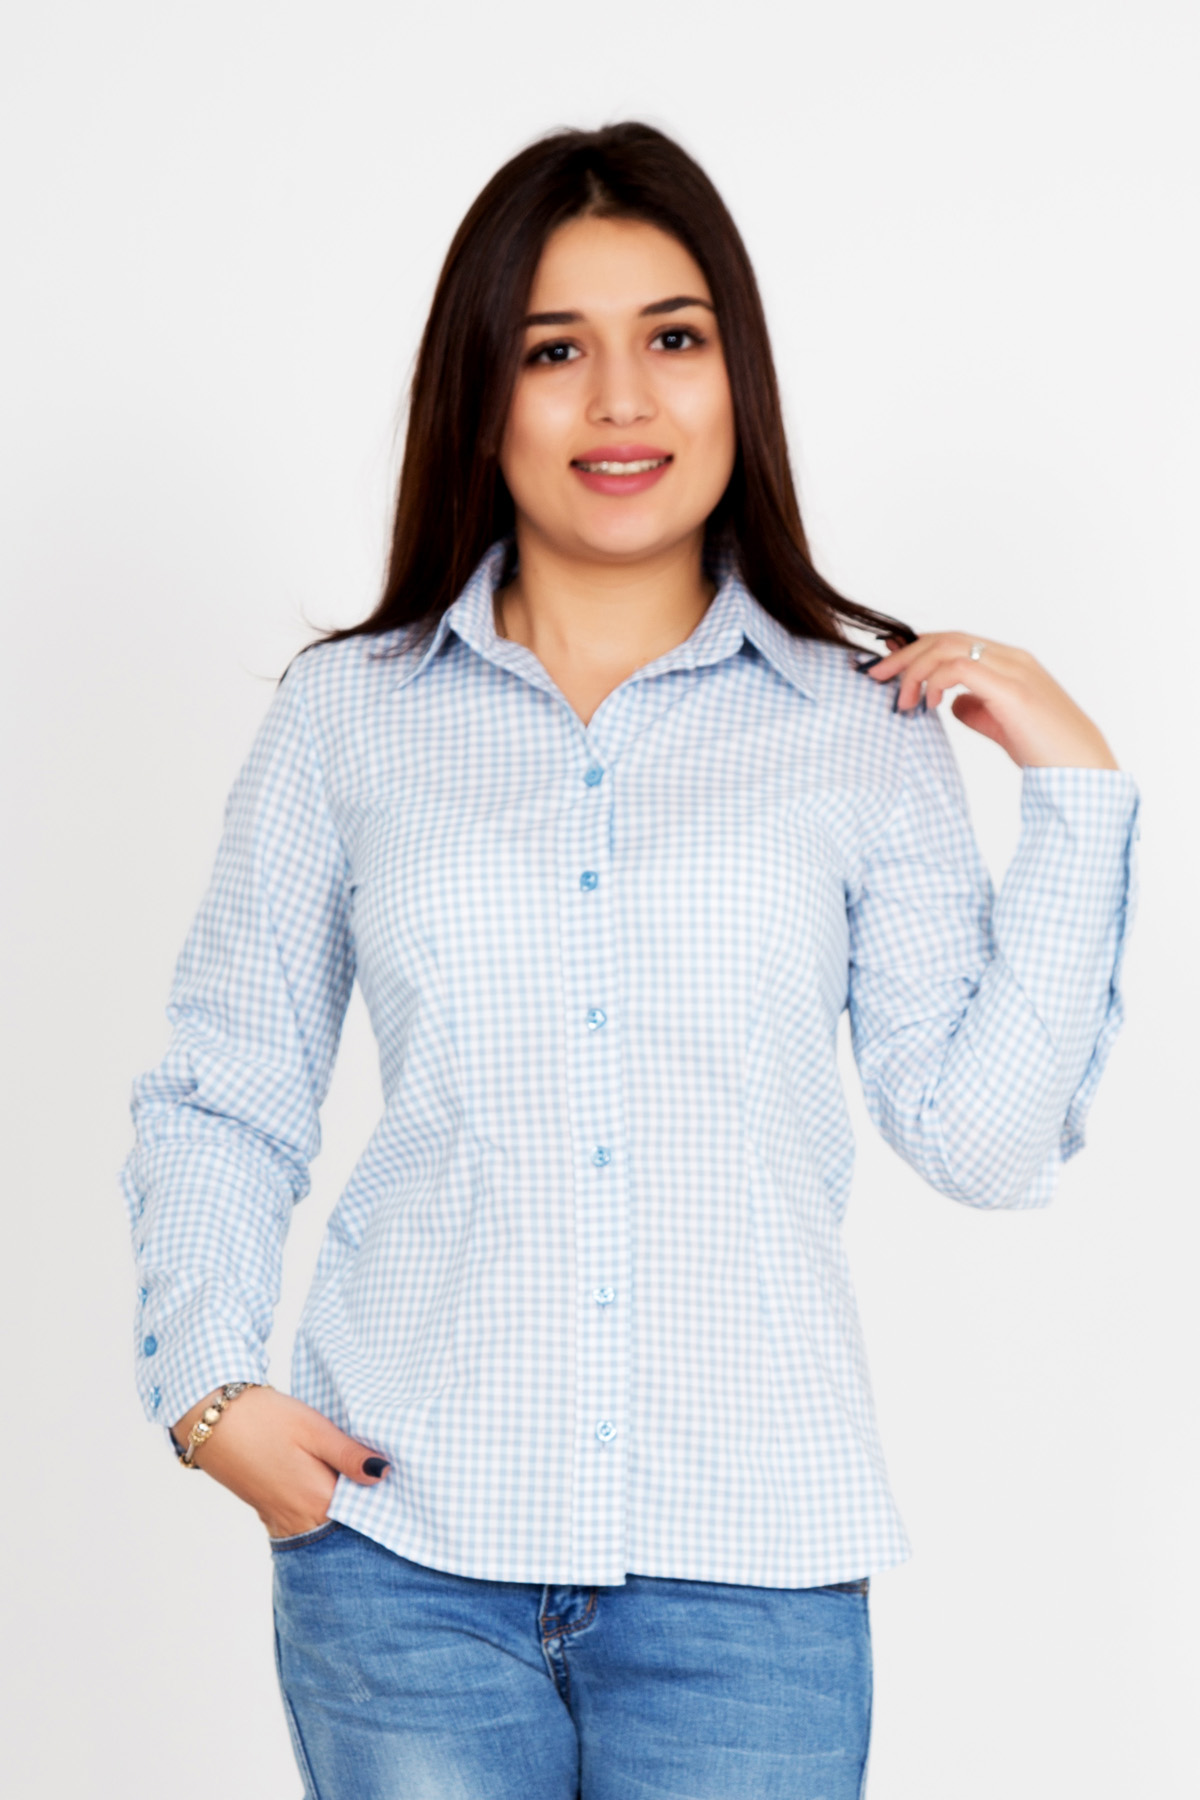 Жен. рубашка Герти р. 42Рубашки<br>Обхват груди: 84 см <br>Обхват талии: 65 см <br>Обхват бедер: 92 см <br>Длина по спинке: 65 см <br>Рост: 167 см<br><br>Тип: Жен. рубашка<br>Размер: 42<br>Материал: Шотландка